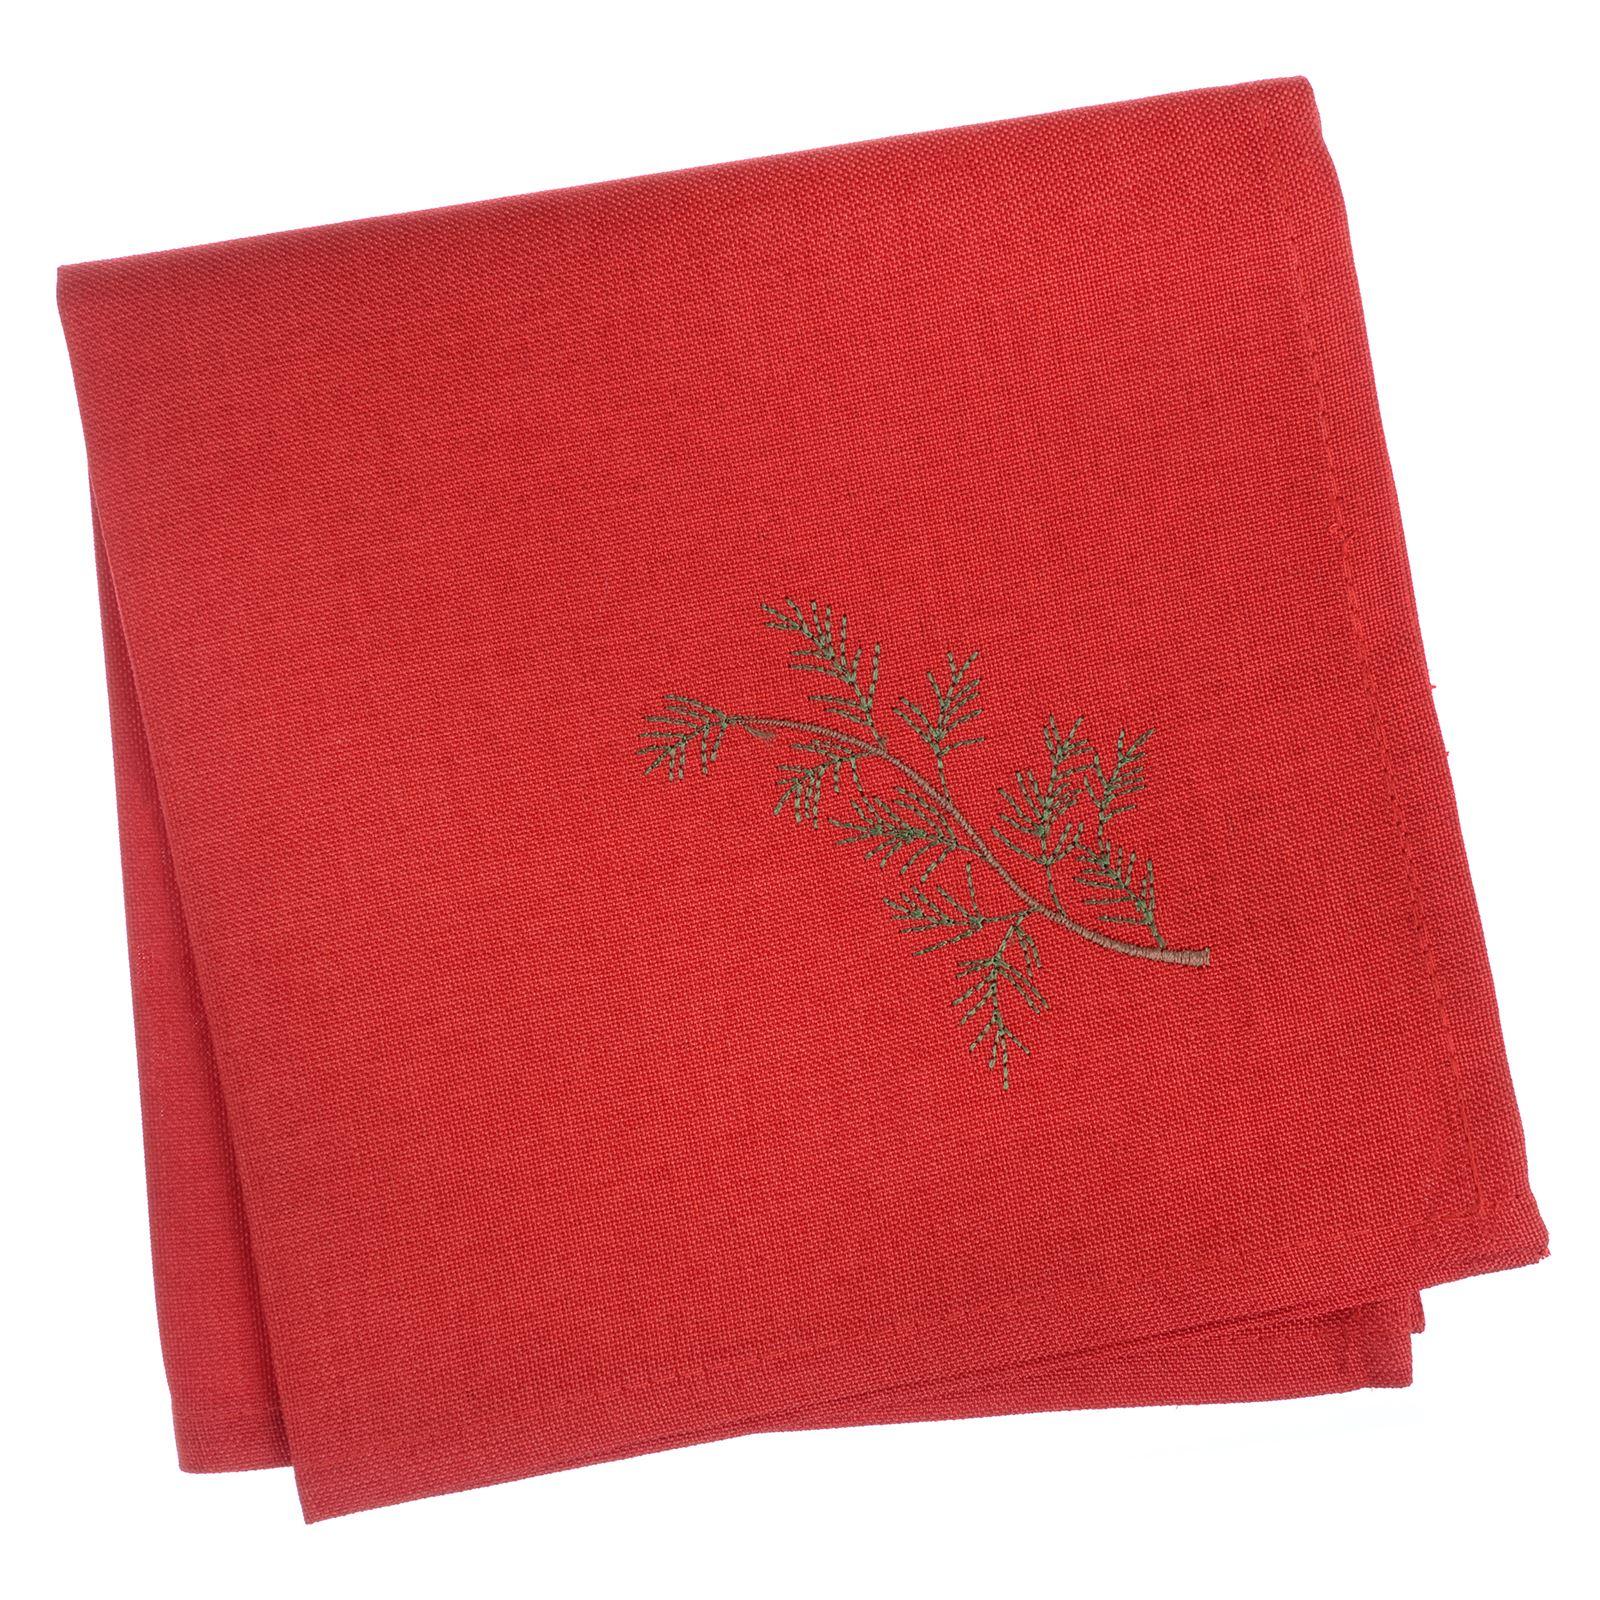 Christmas-Tablecloth-Festive-Pattern-Rectangle-Round-Fabric-Xmas-Room-Decoration Indexbild 133